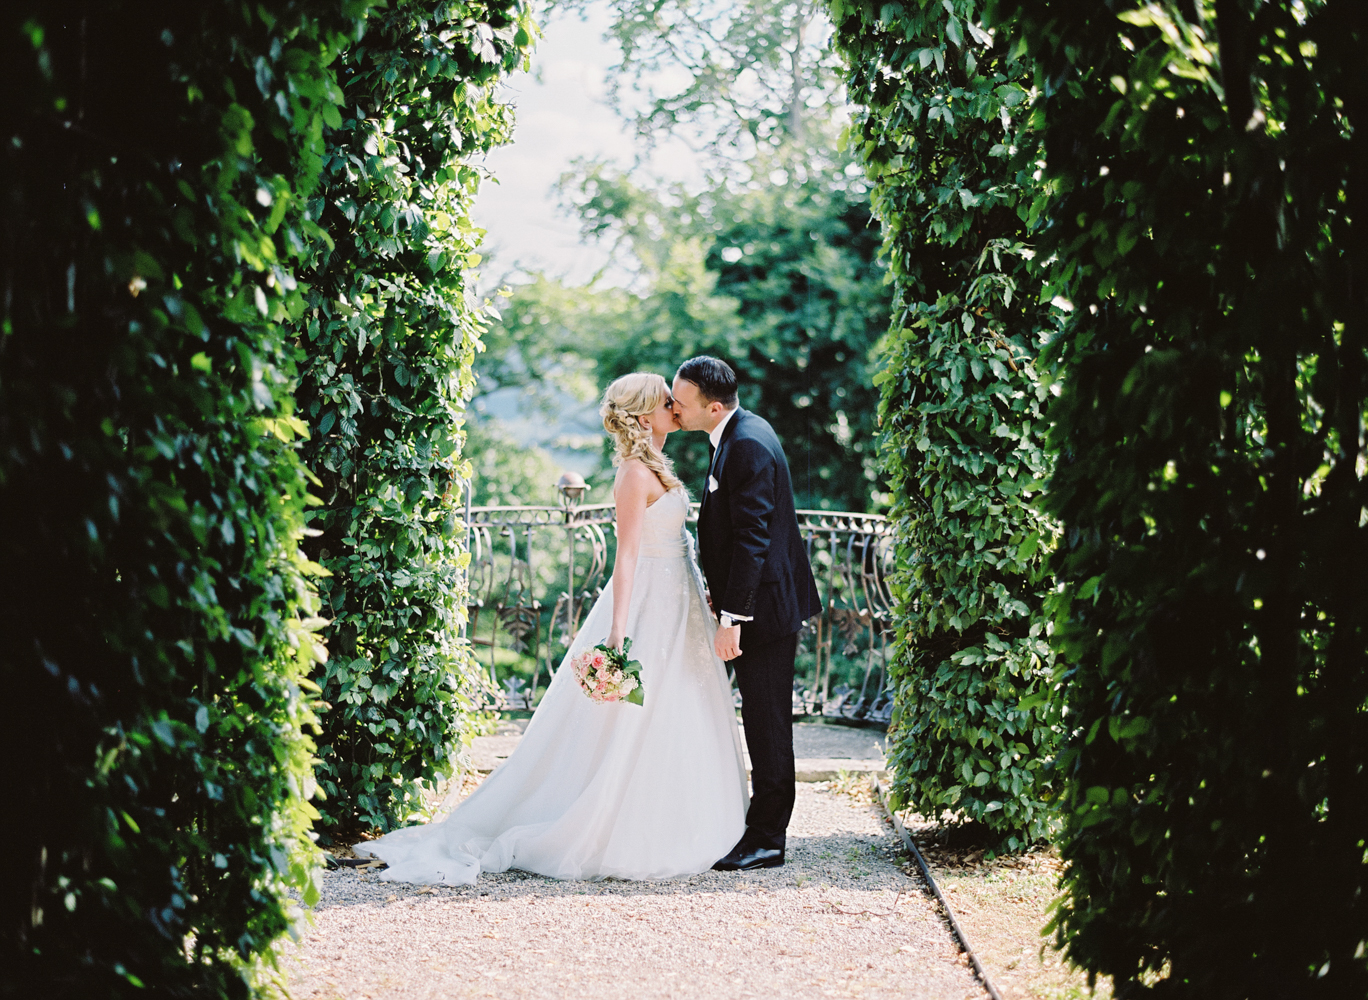 Hochzeitsfotograf_Stuttgart_Karoline_Kirchhof (1).jpg